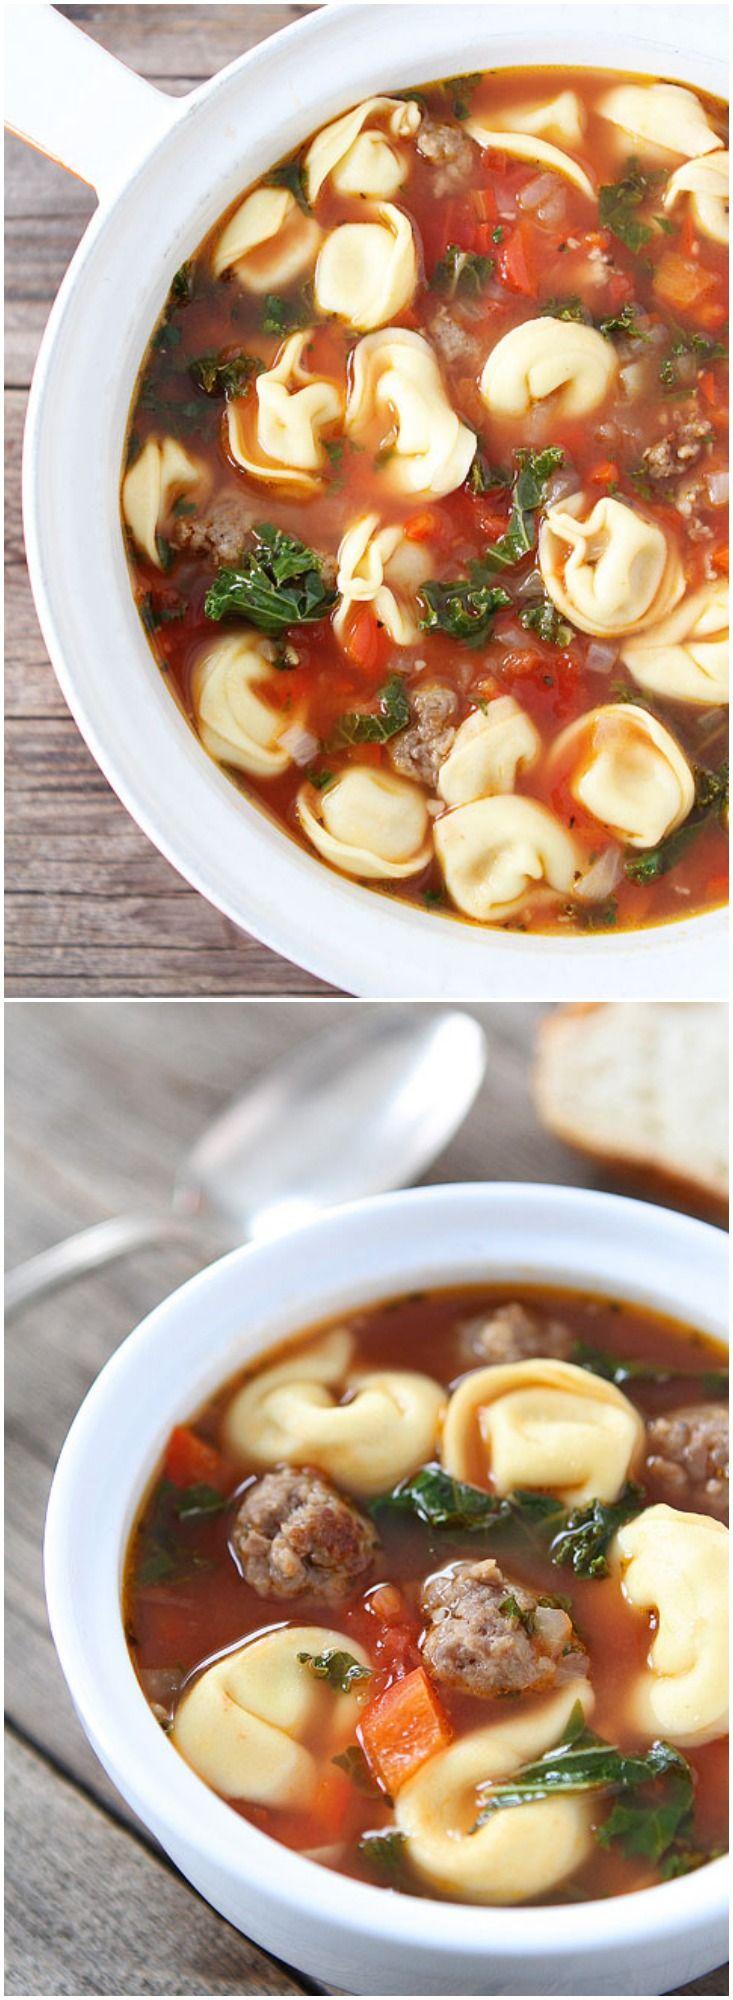 Italian Sausage Tortellini Soup Recipe on twopeasandtheirpod.com This ...